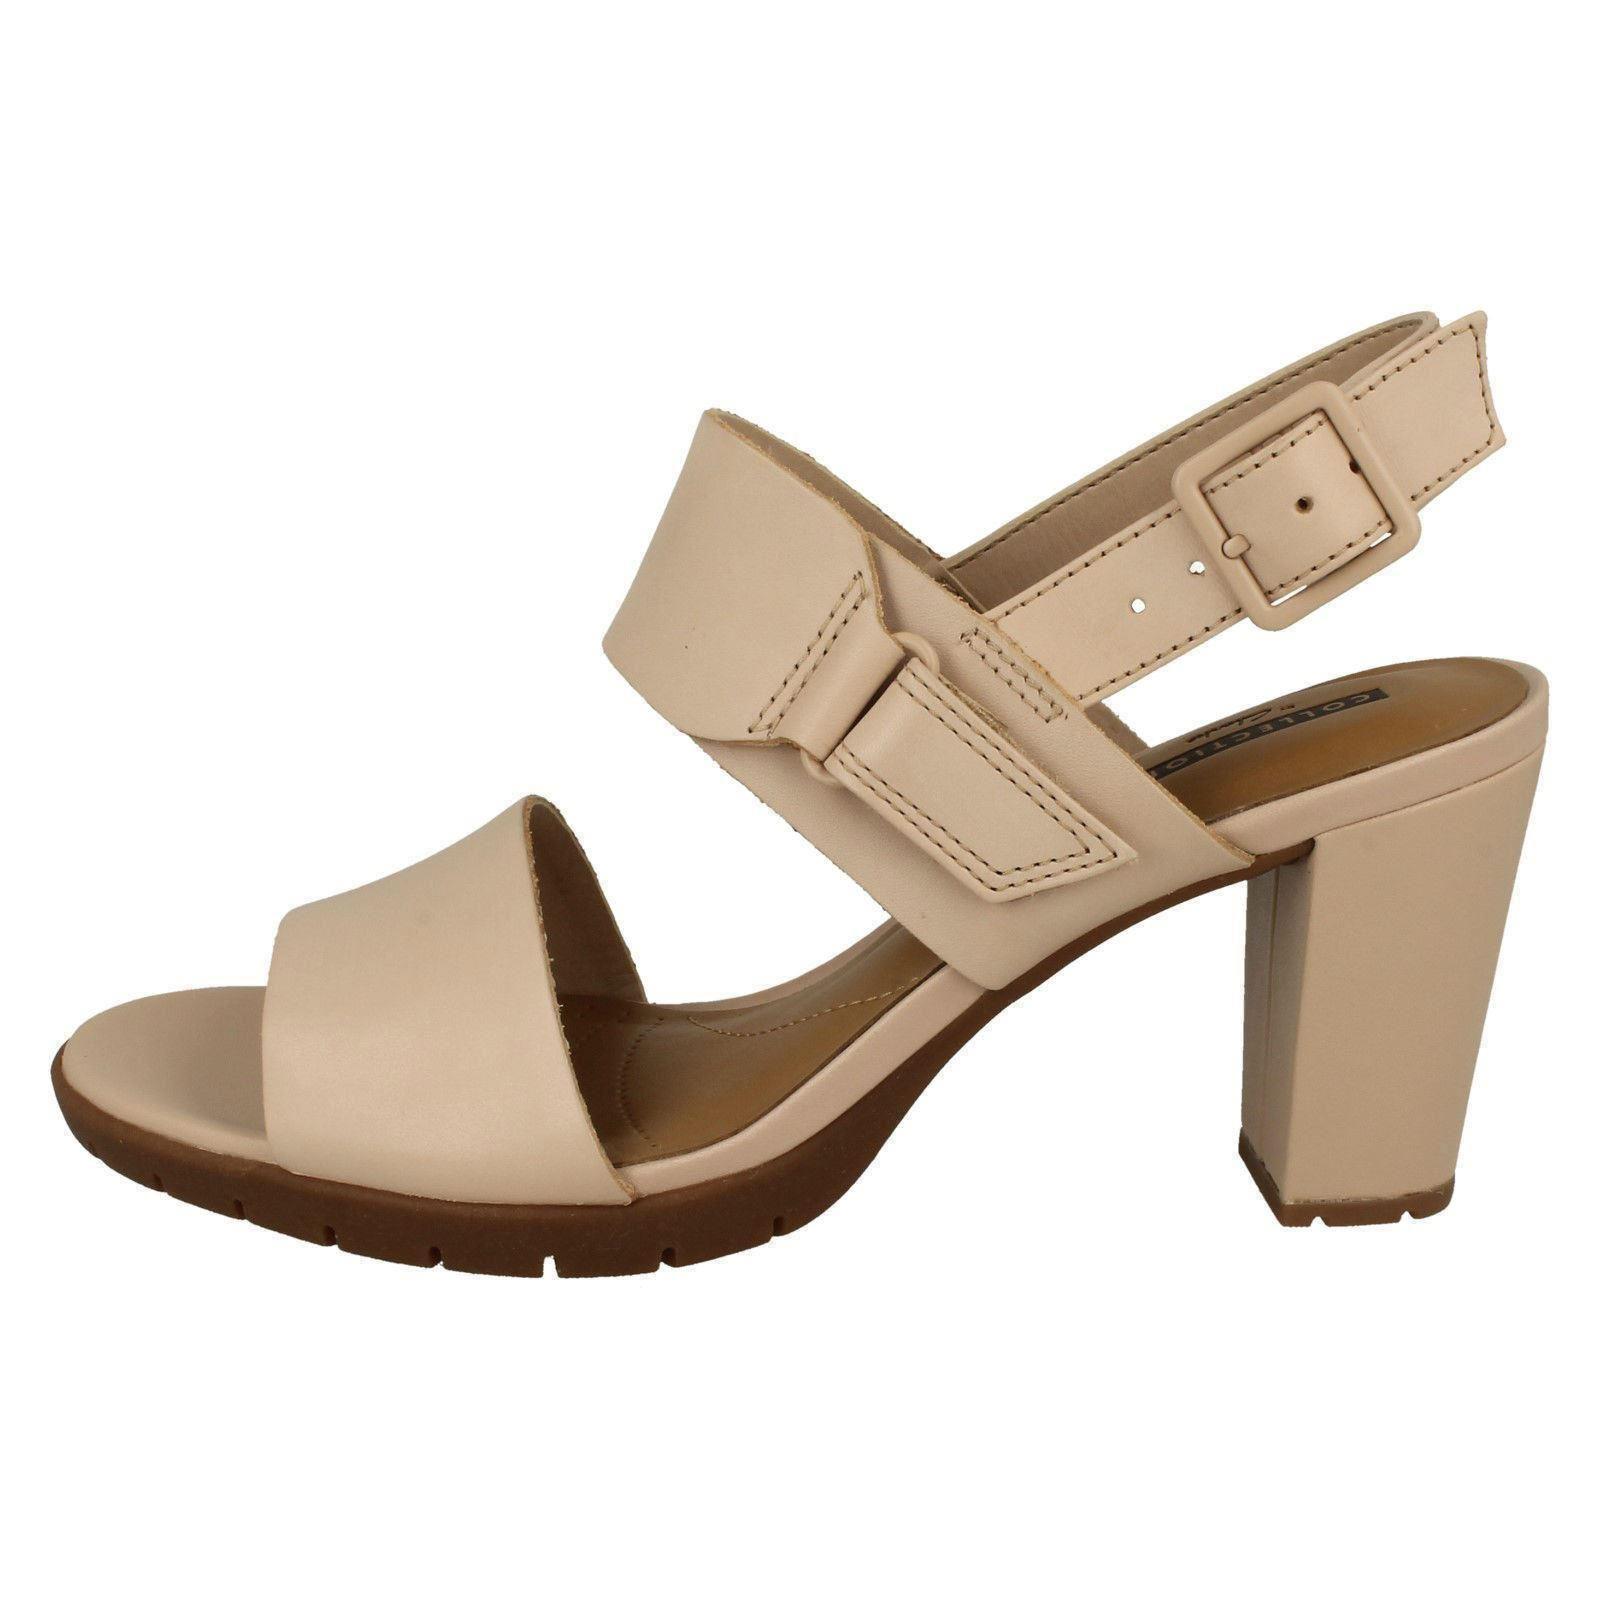 Clarks Slingback Shoes